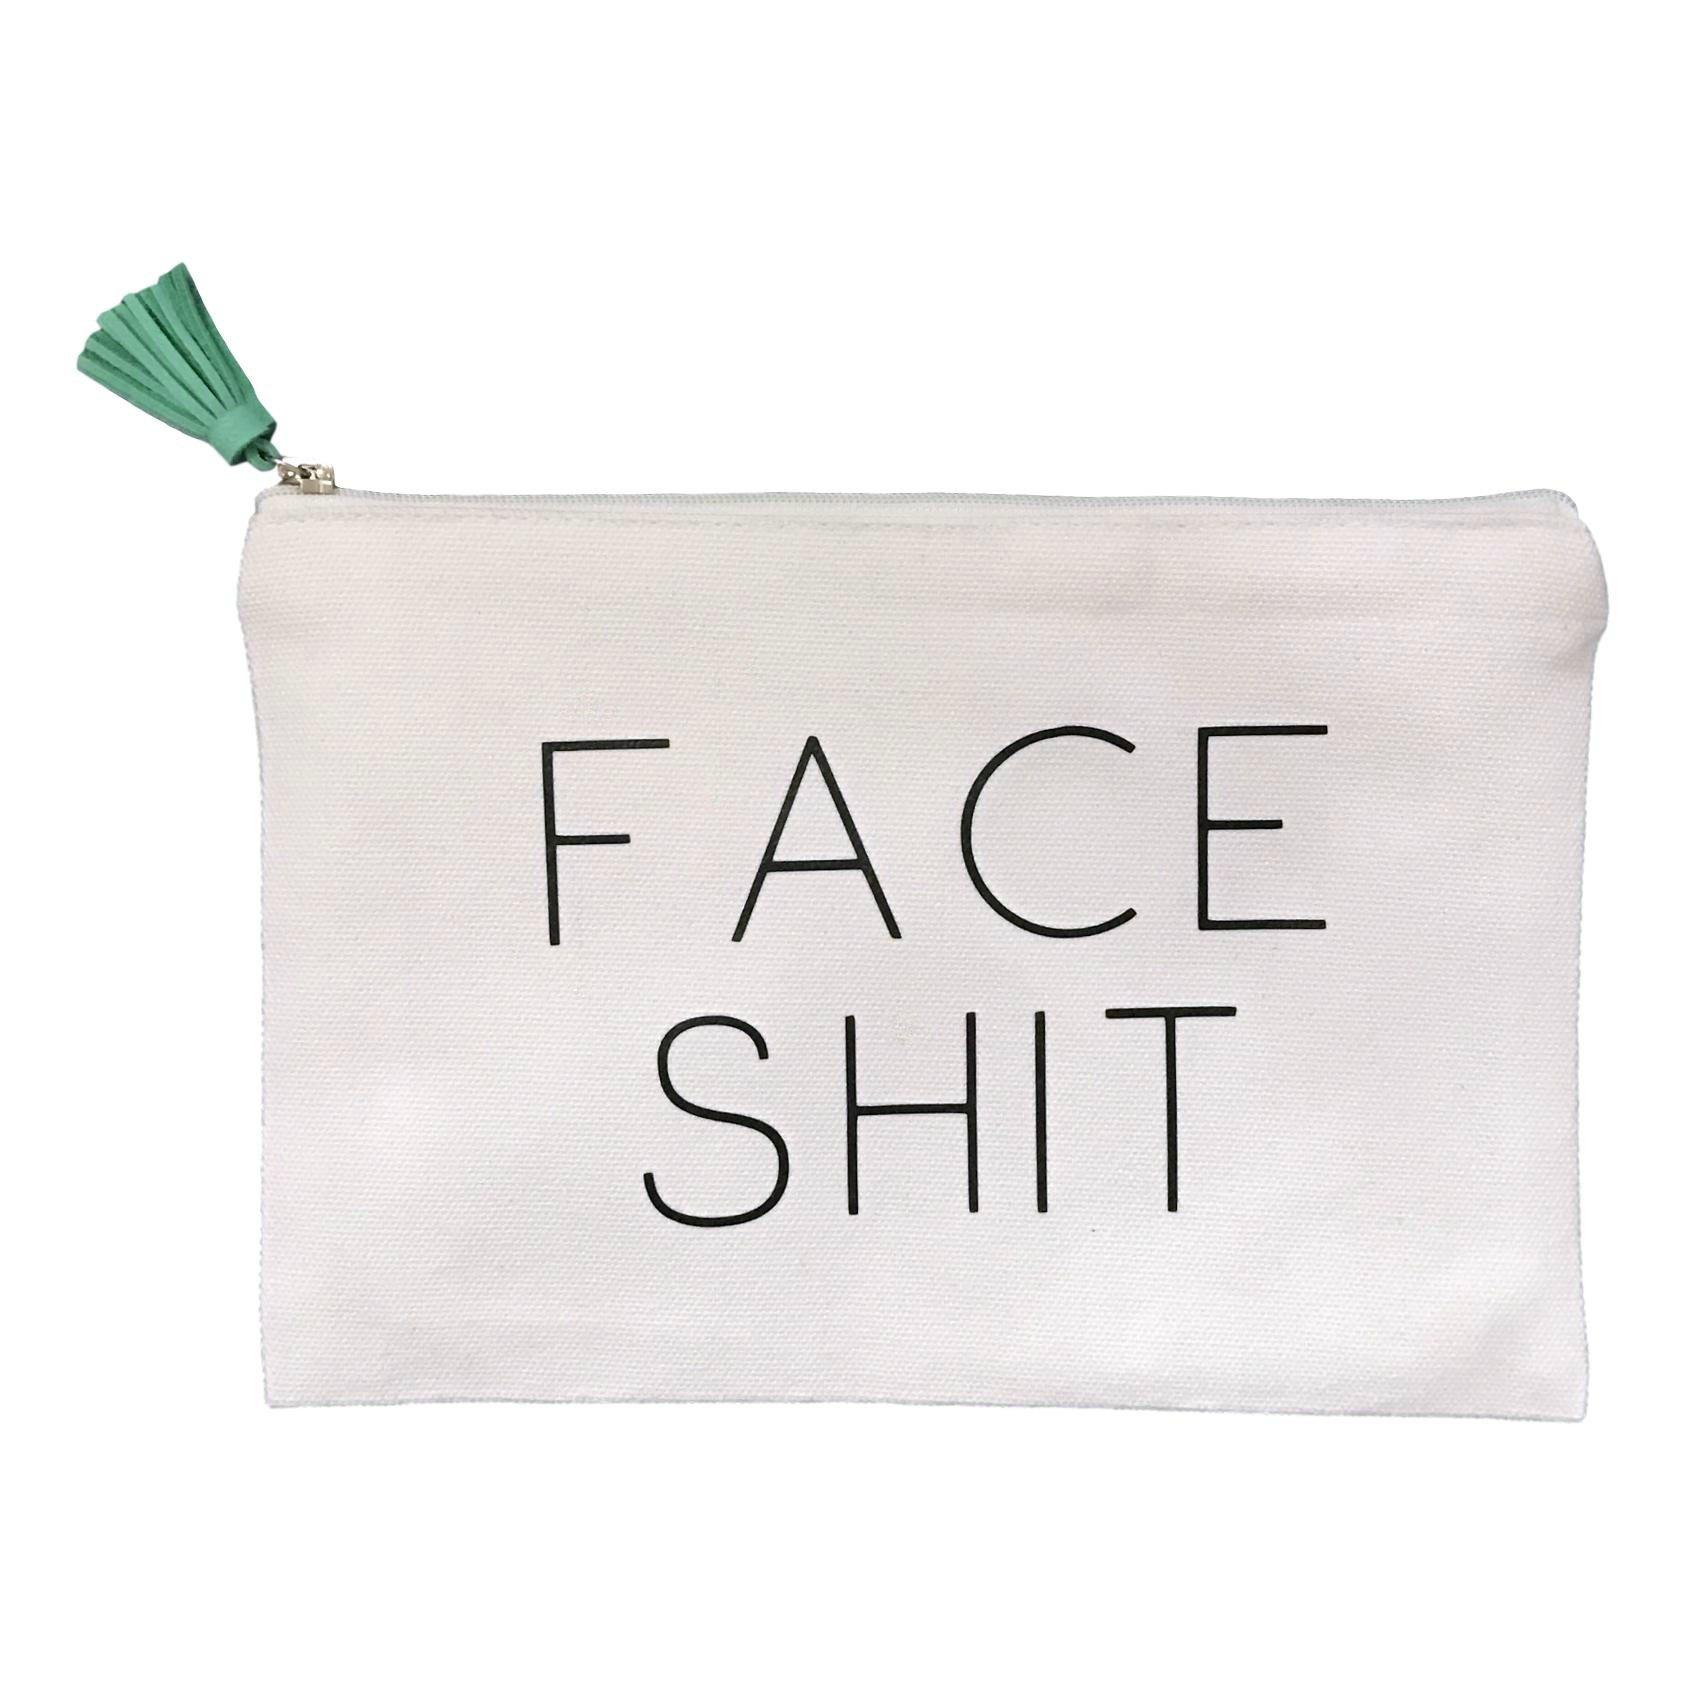 Face Shit Makeup Bag w/Tassel